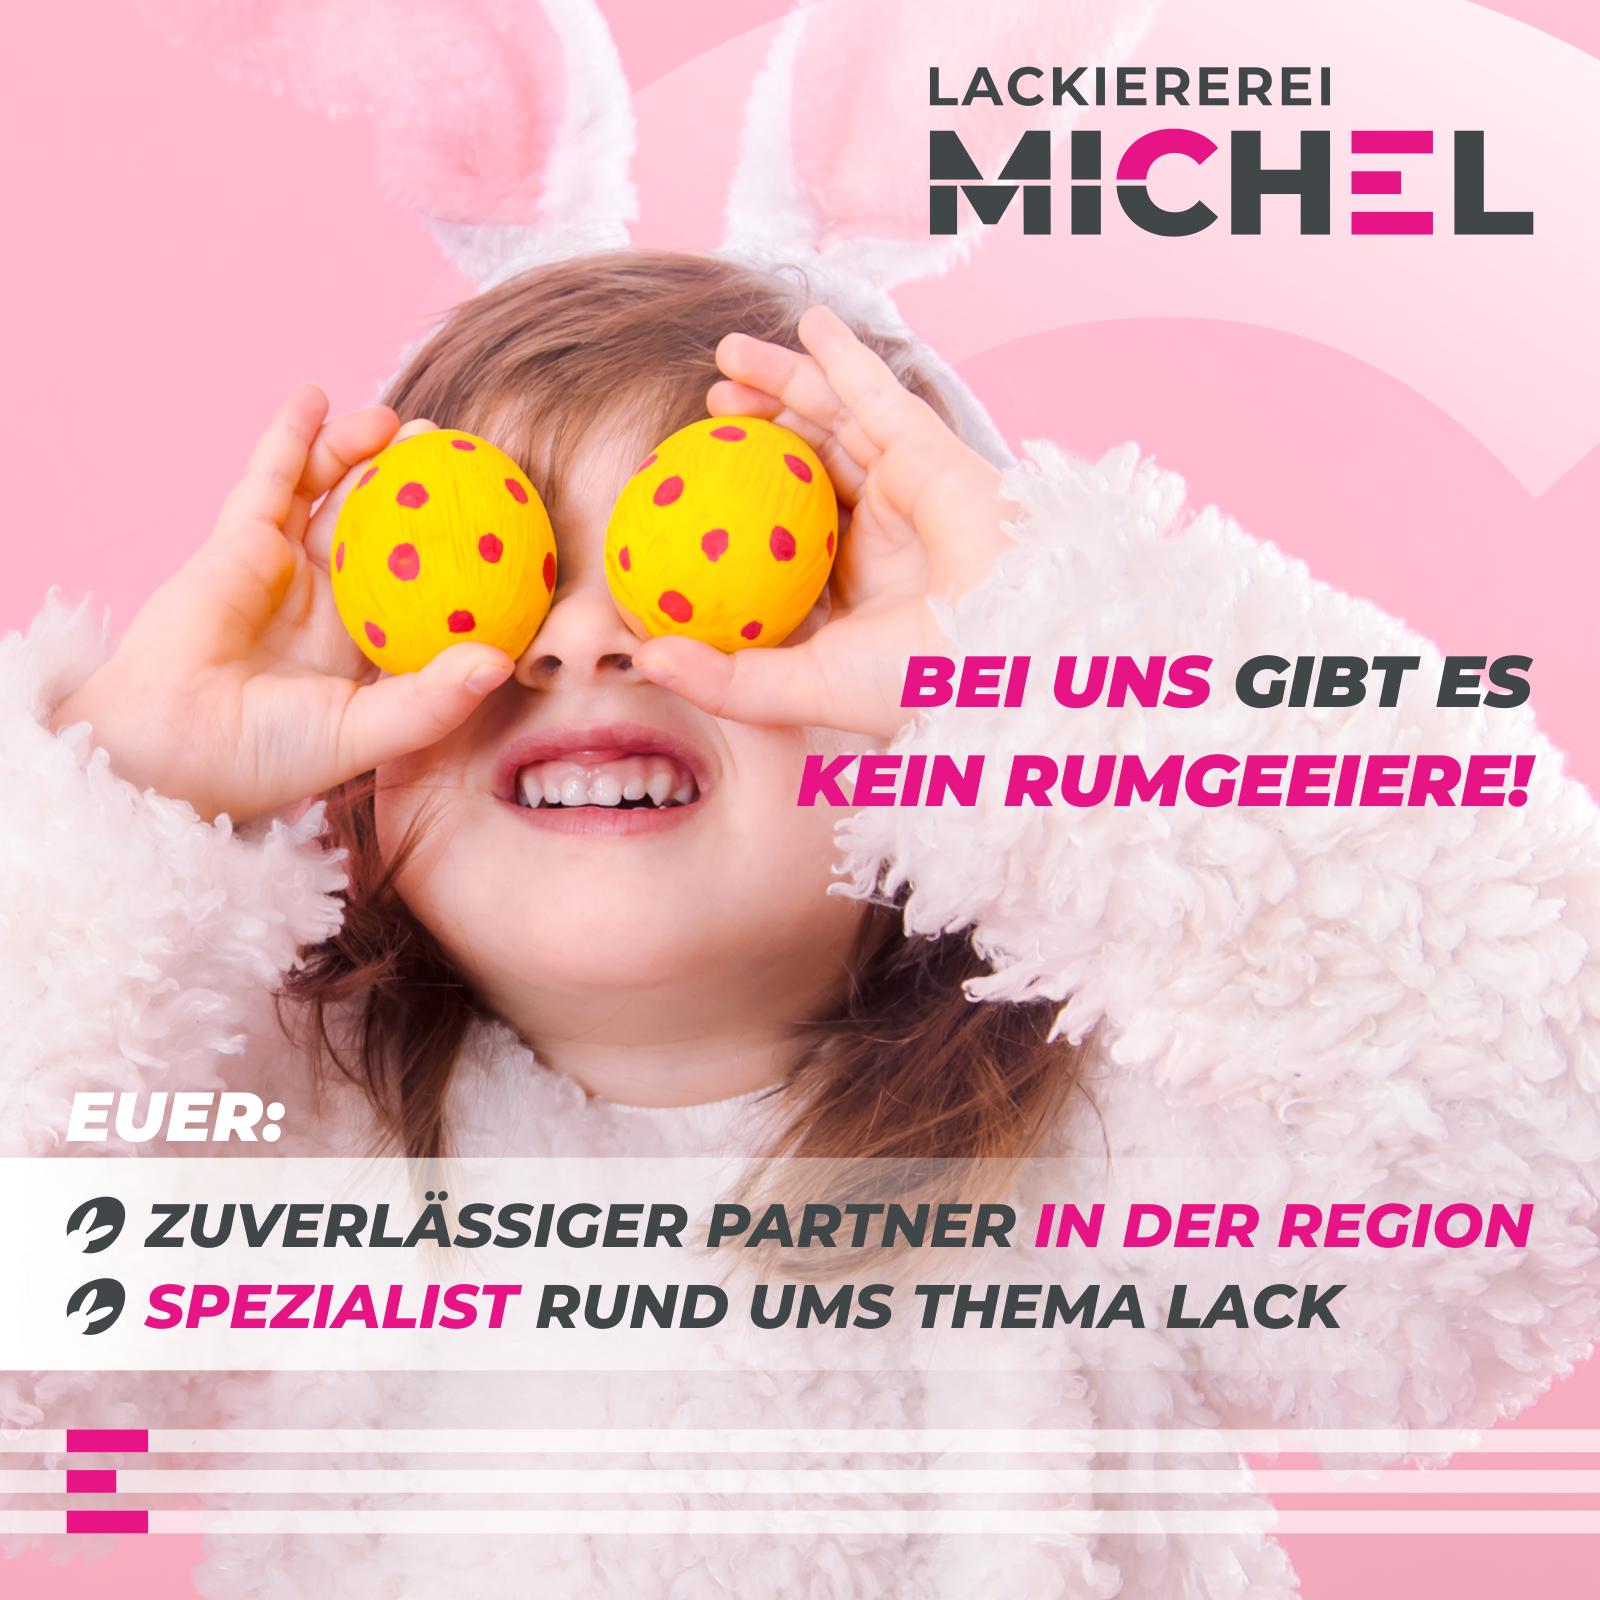 Ostern Lackiererei Michel